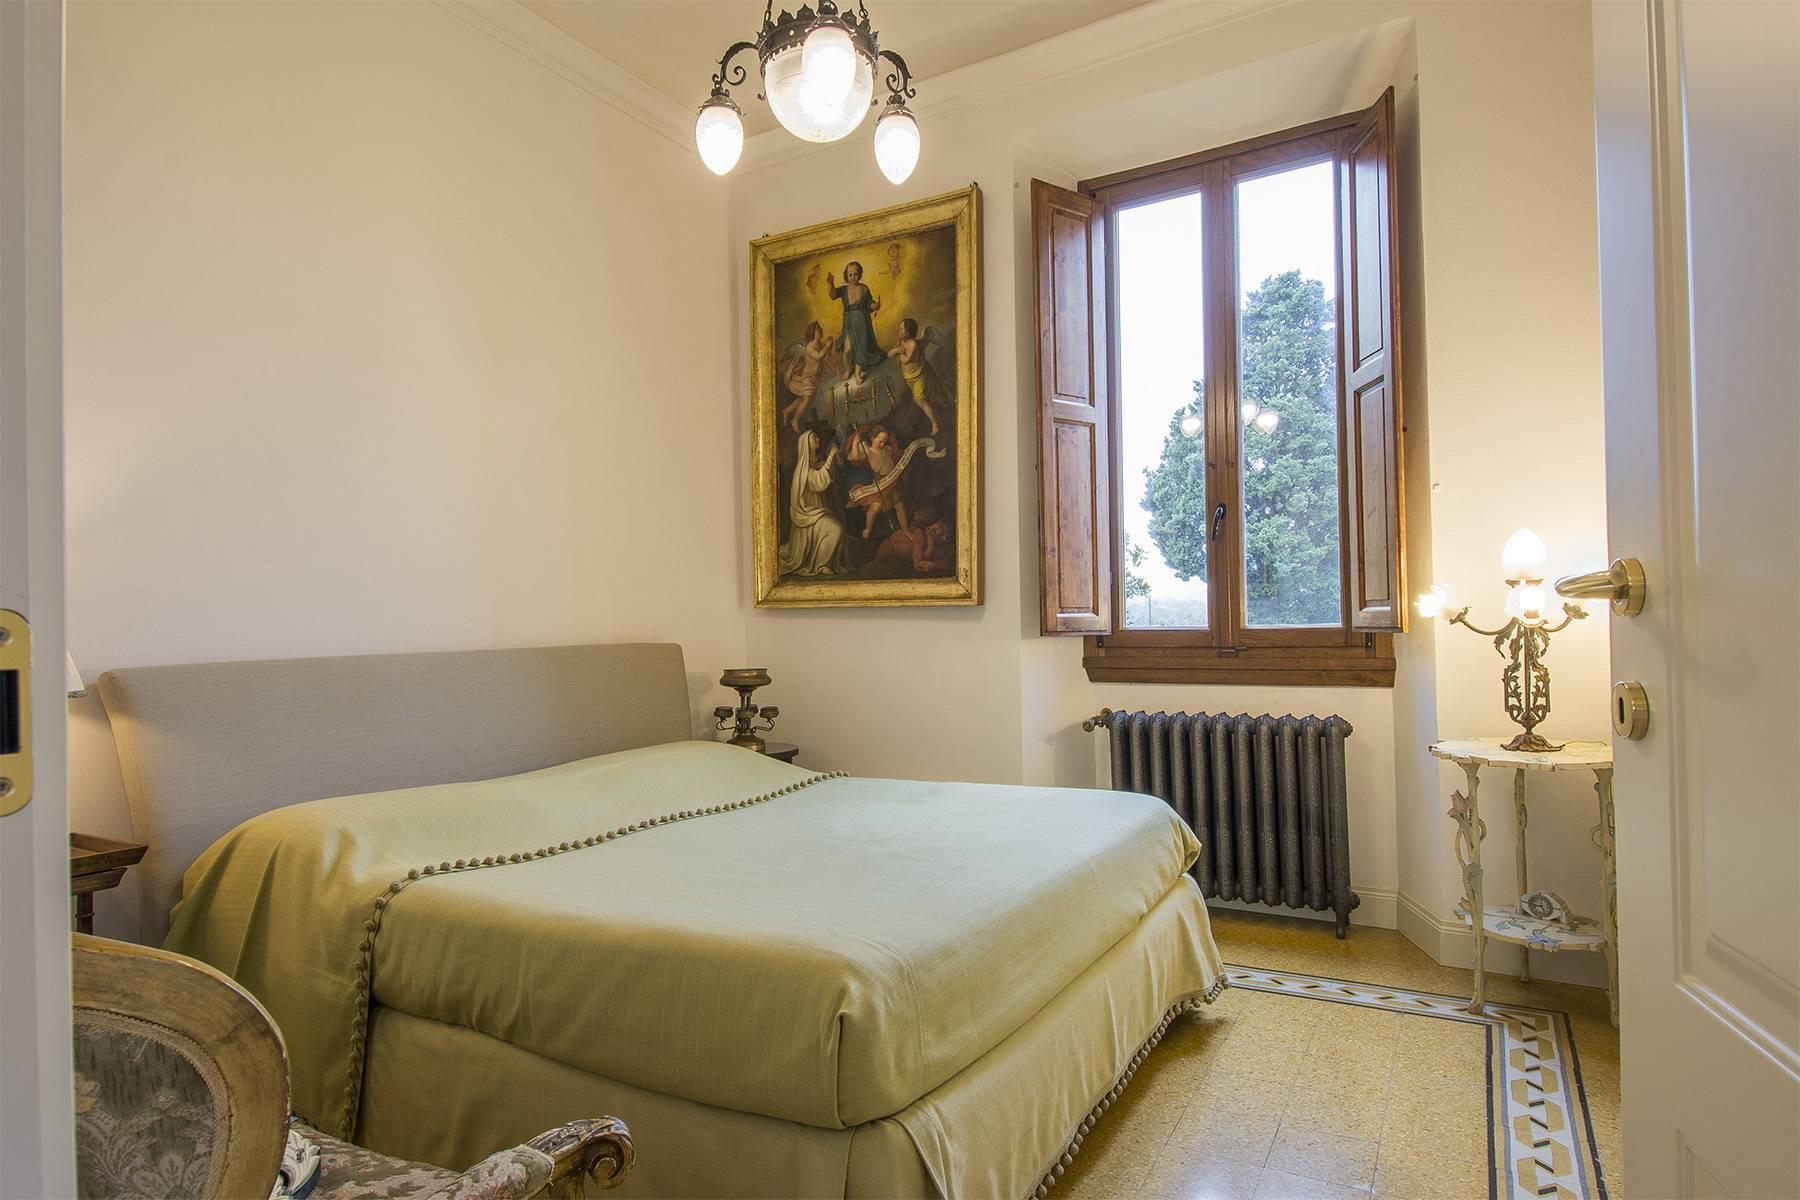 Exquisite apartment within a historic villa - 12